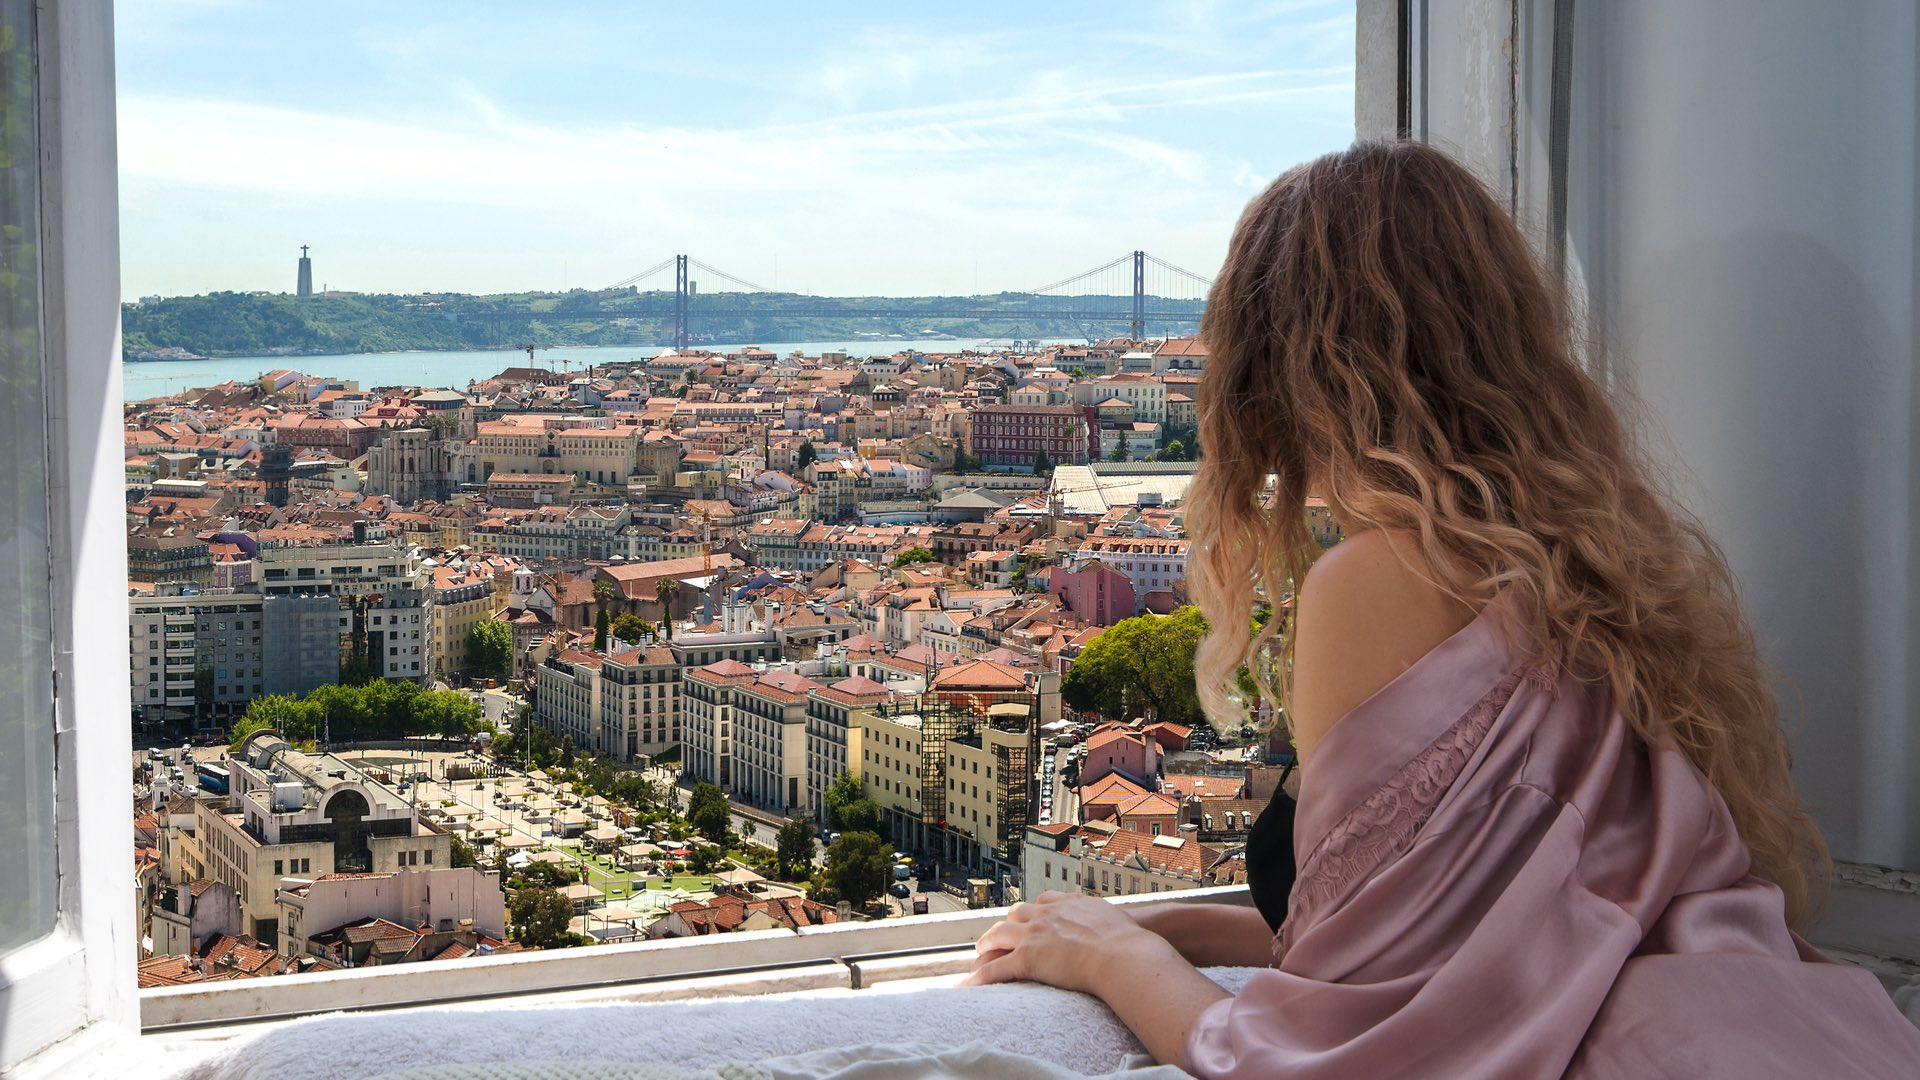 Portugal | Lissabon | ©seligaa/Shutterstock.com